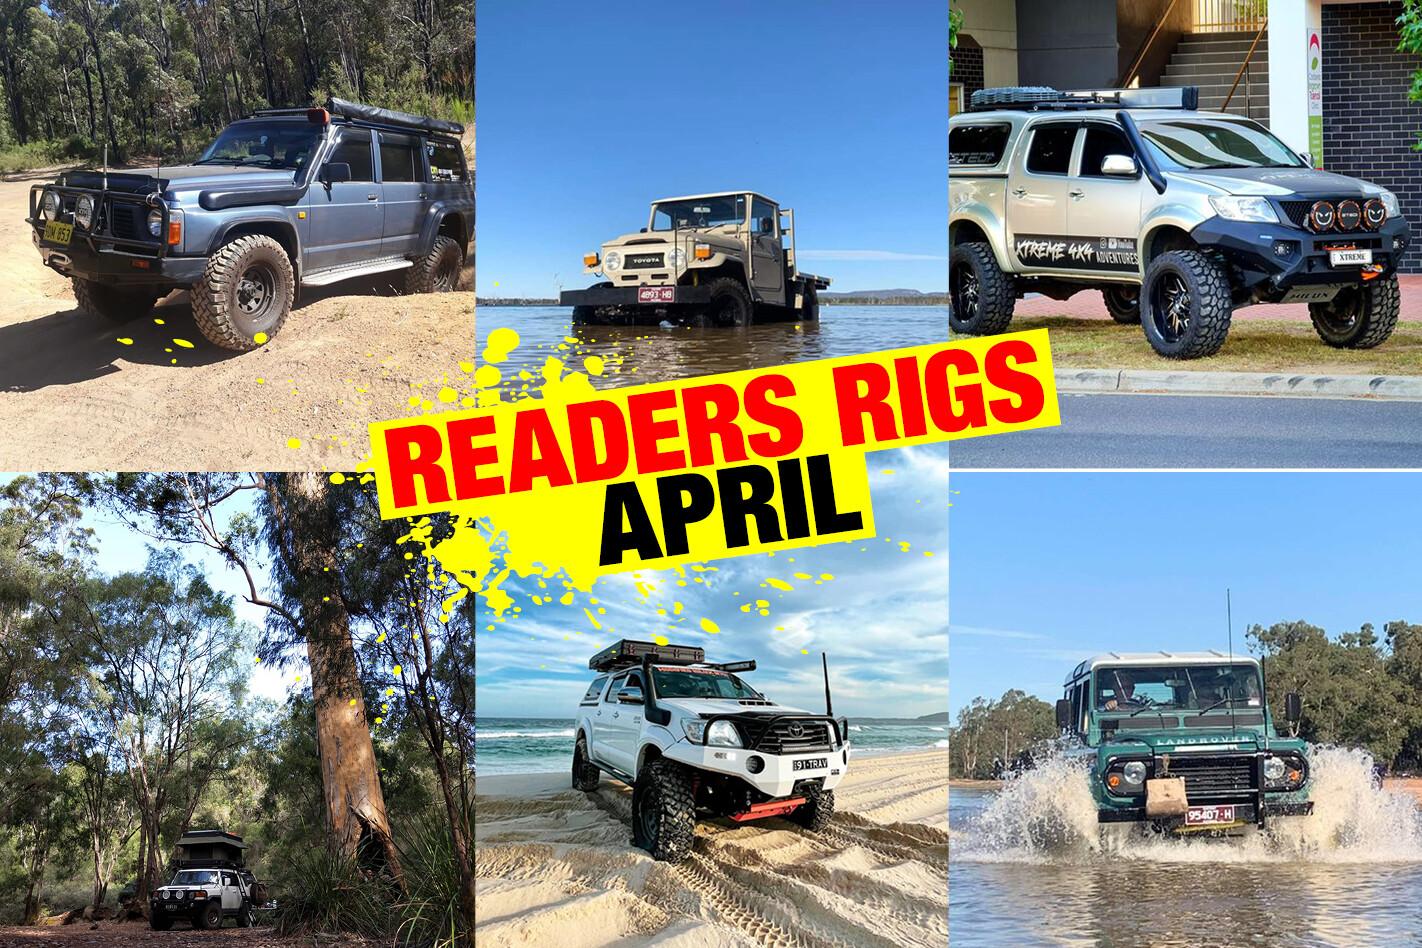 Readers 4x4s April 2021